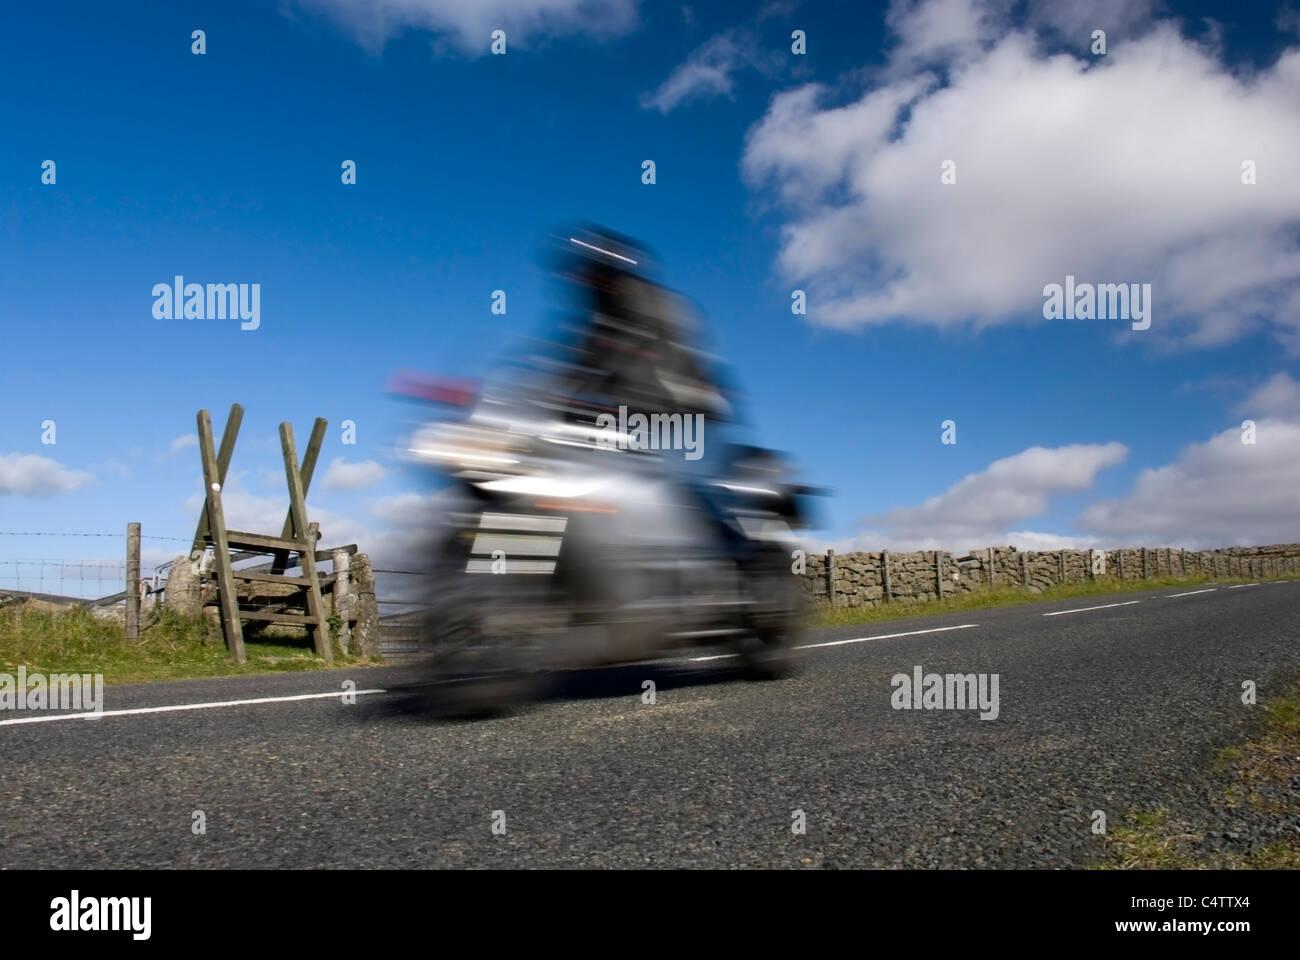 Blurred speeding motorbike on mountain road. Dartmoor, Devon, England - Stock Image